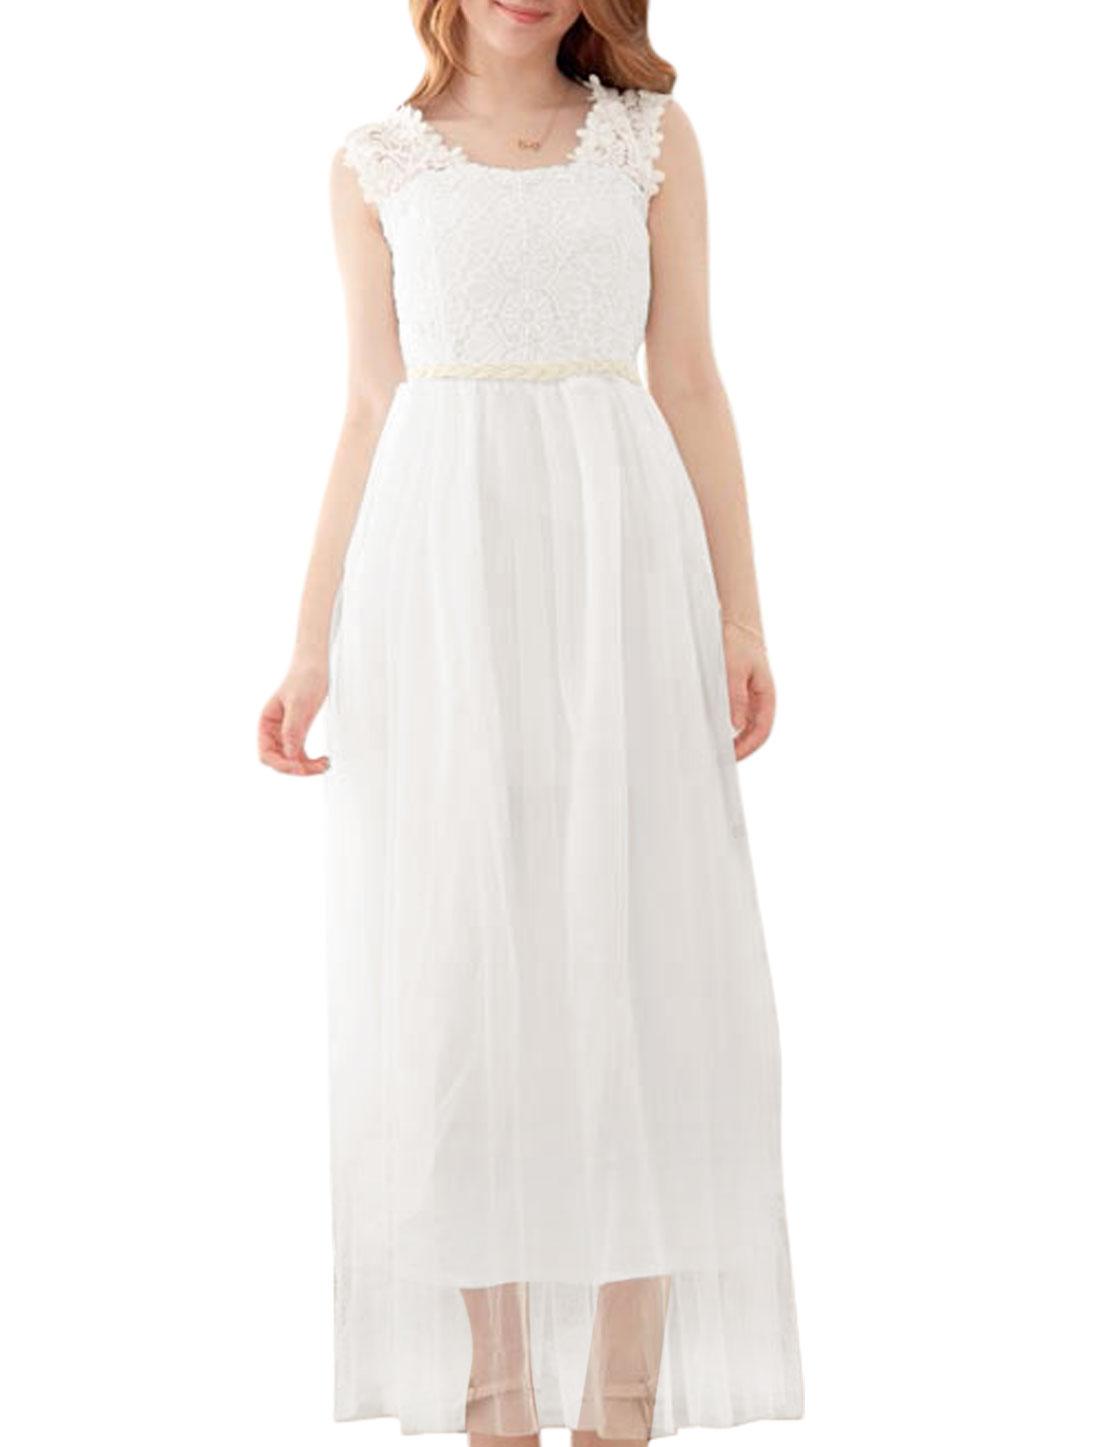 Women Beads Decor Crochet Mesh Maxi Dress White XS